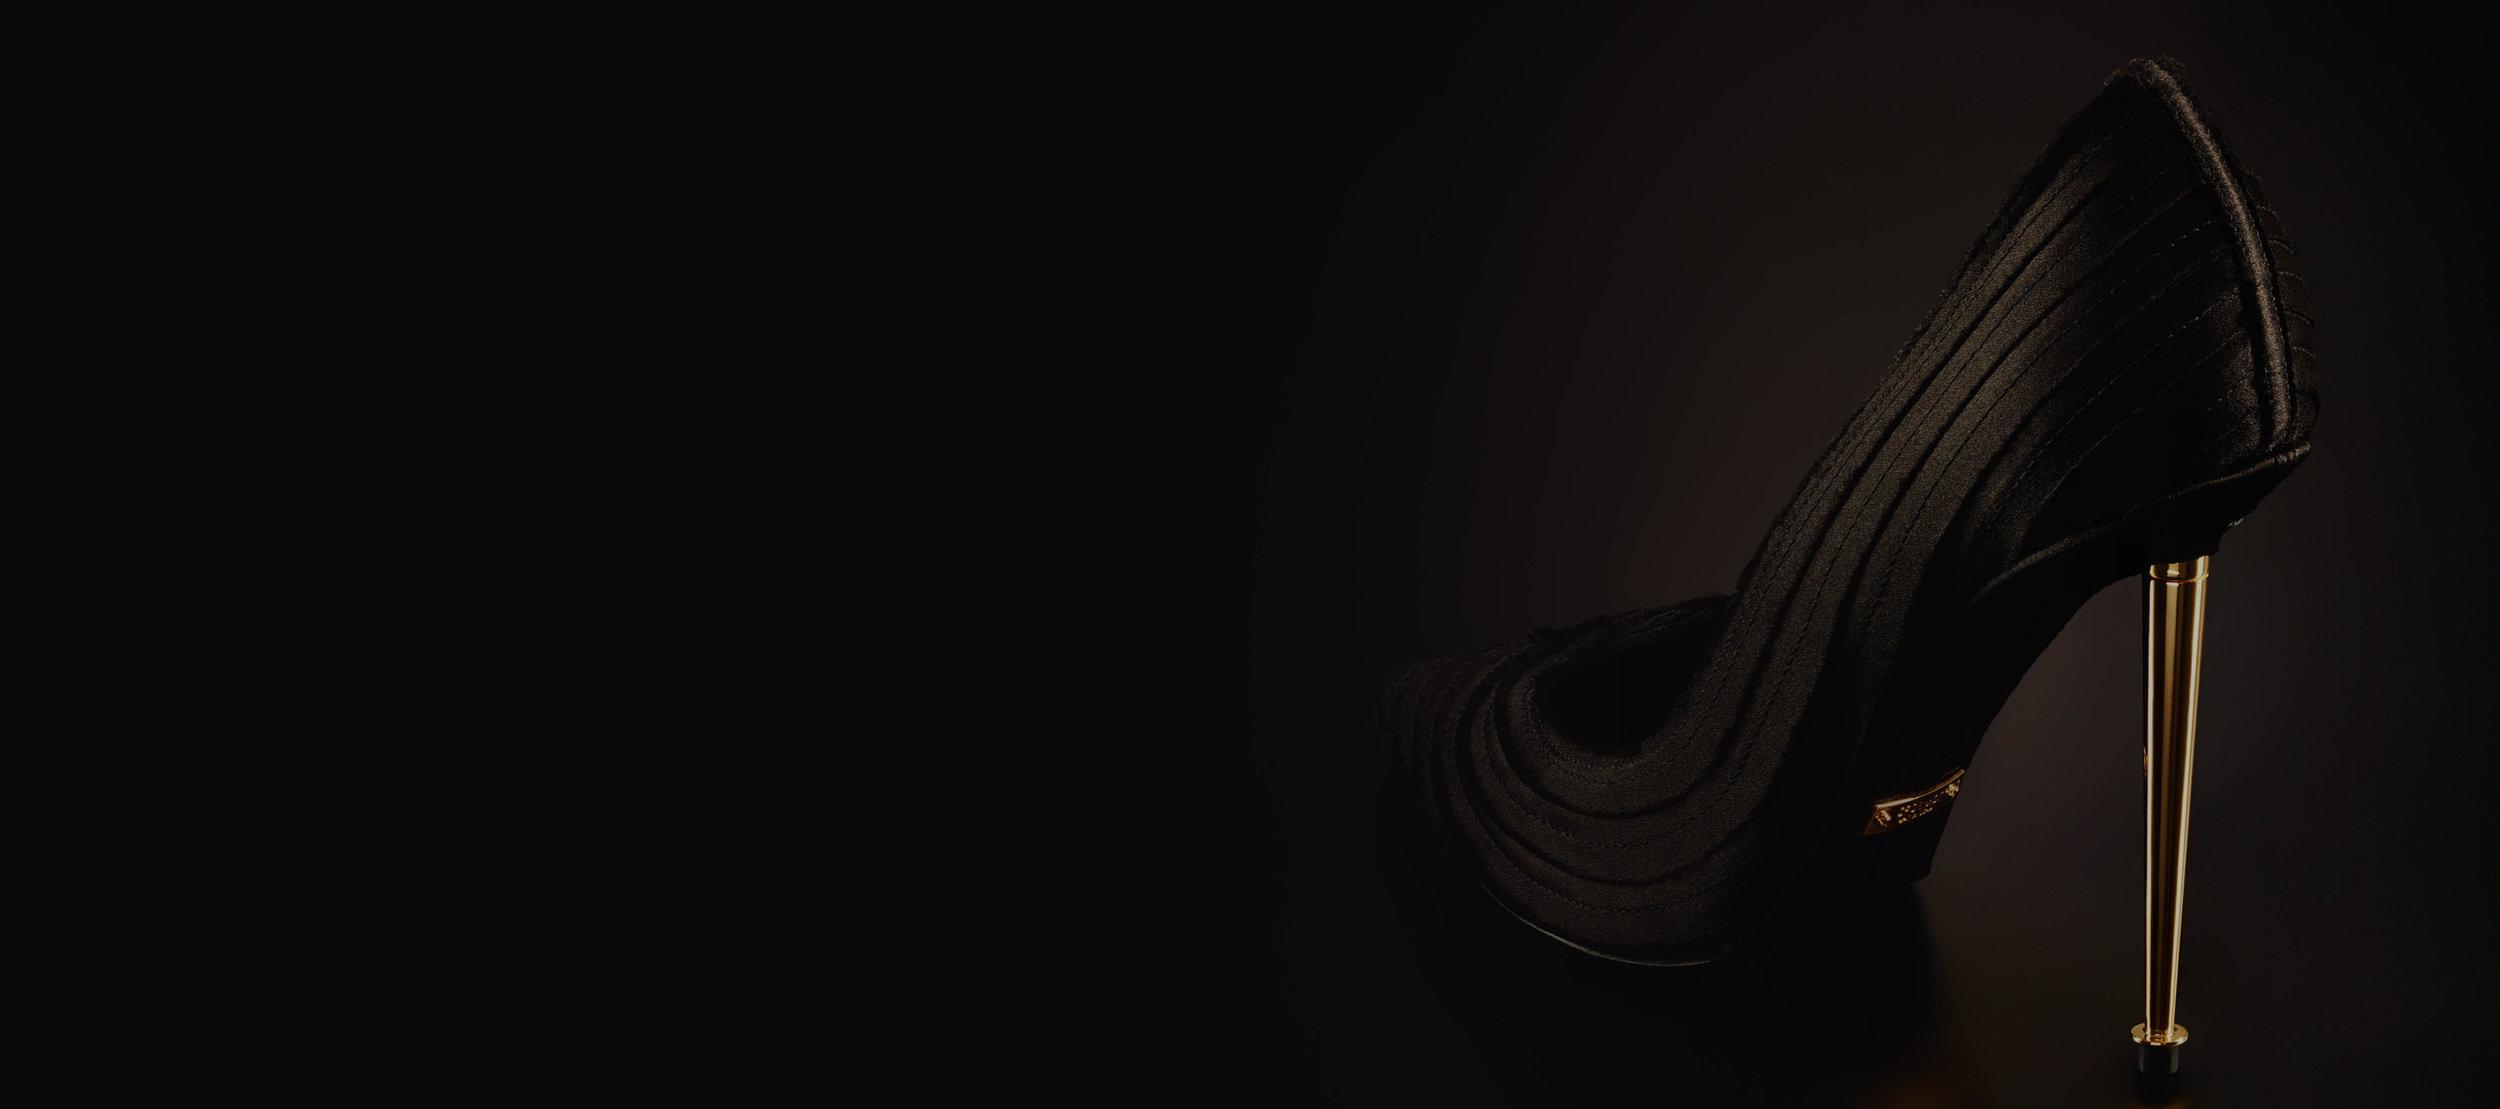 FrayedPump_W1831T_MOBILE_1.jpg